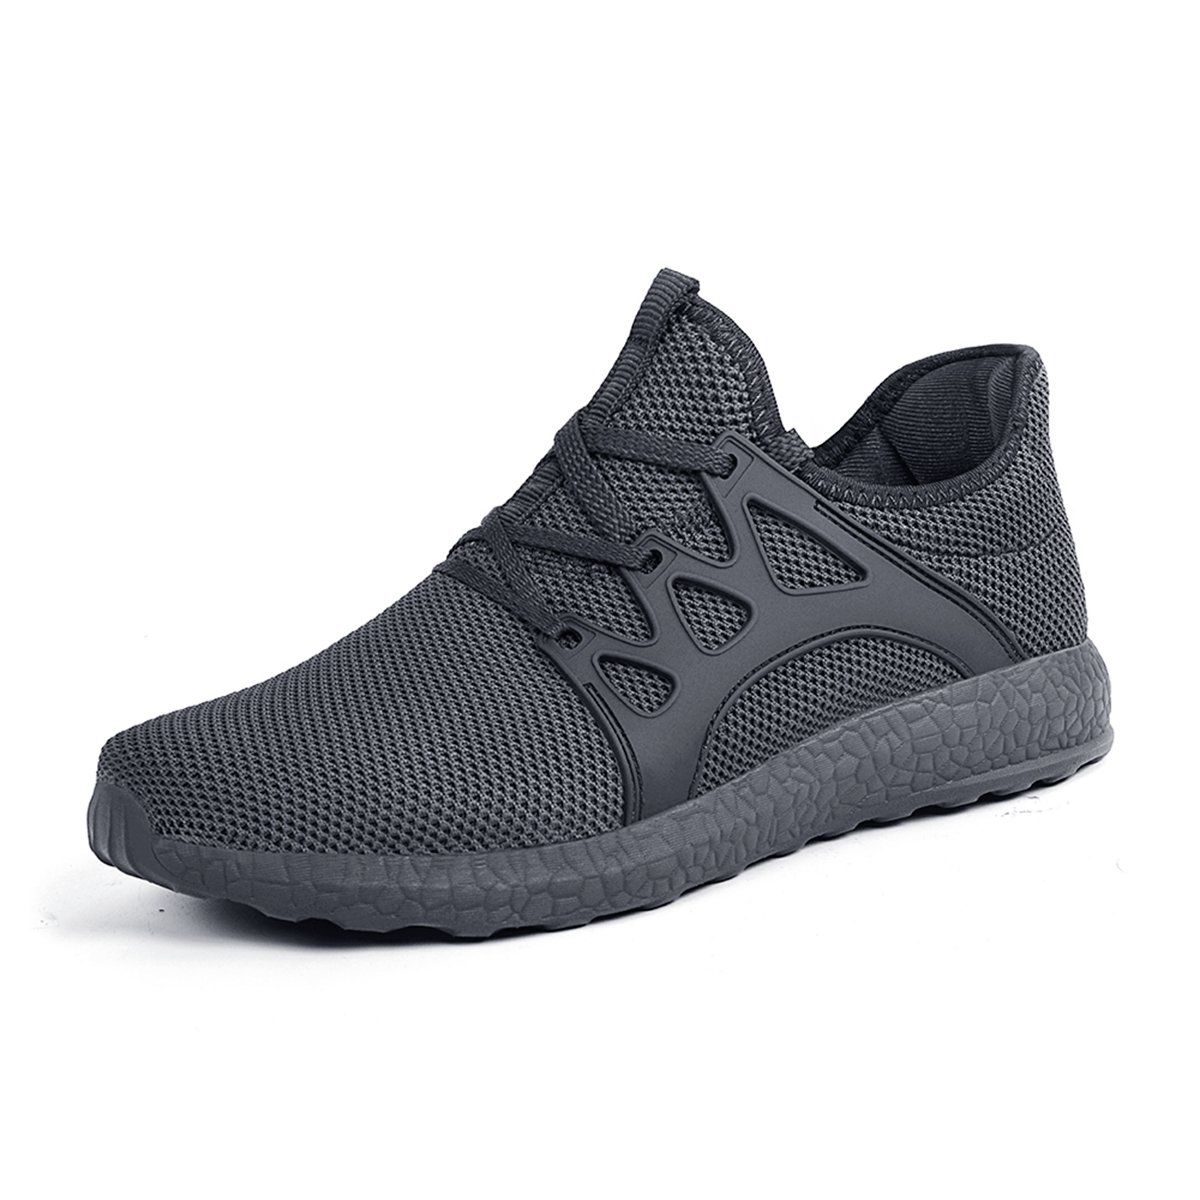 Best Rated in Men's Walking Shoes & Helpful Customer